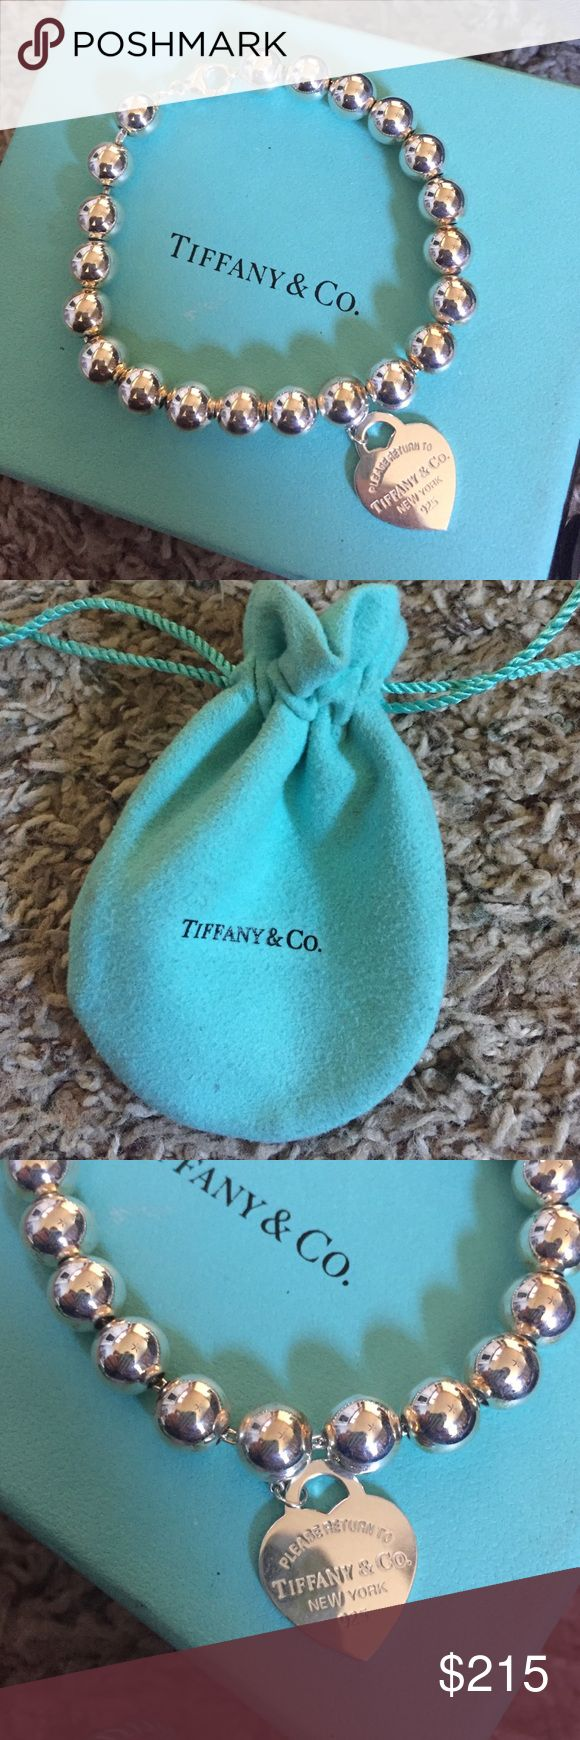 Elegant Tiffany Bead Bracelet